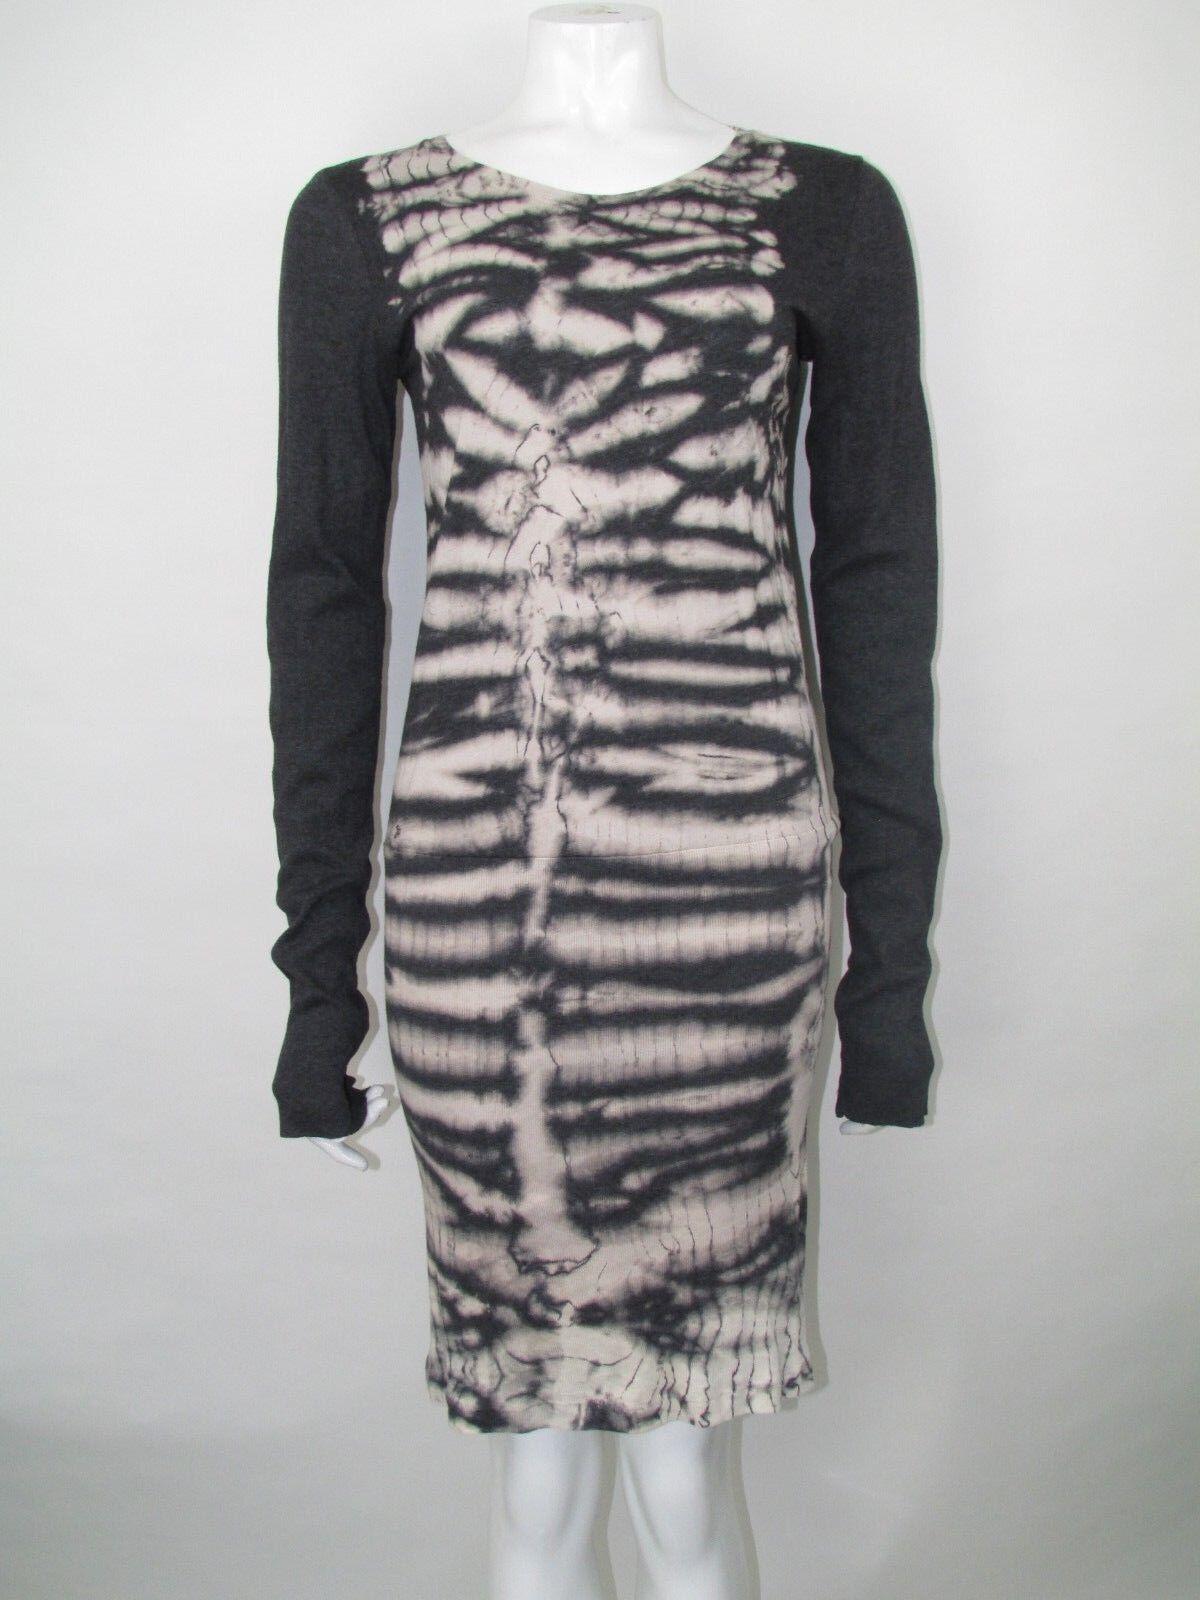 Raquel Allegra Rib Tie Dye Woven Jumper Dress Größe 3 BNWTS